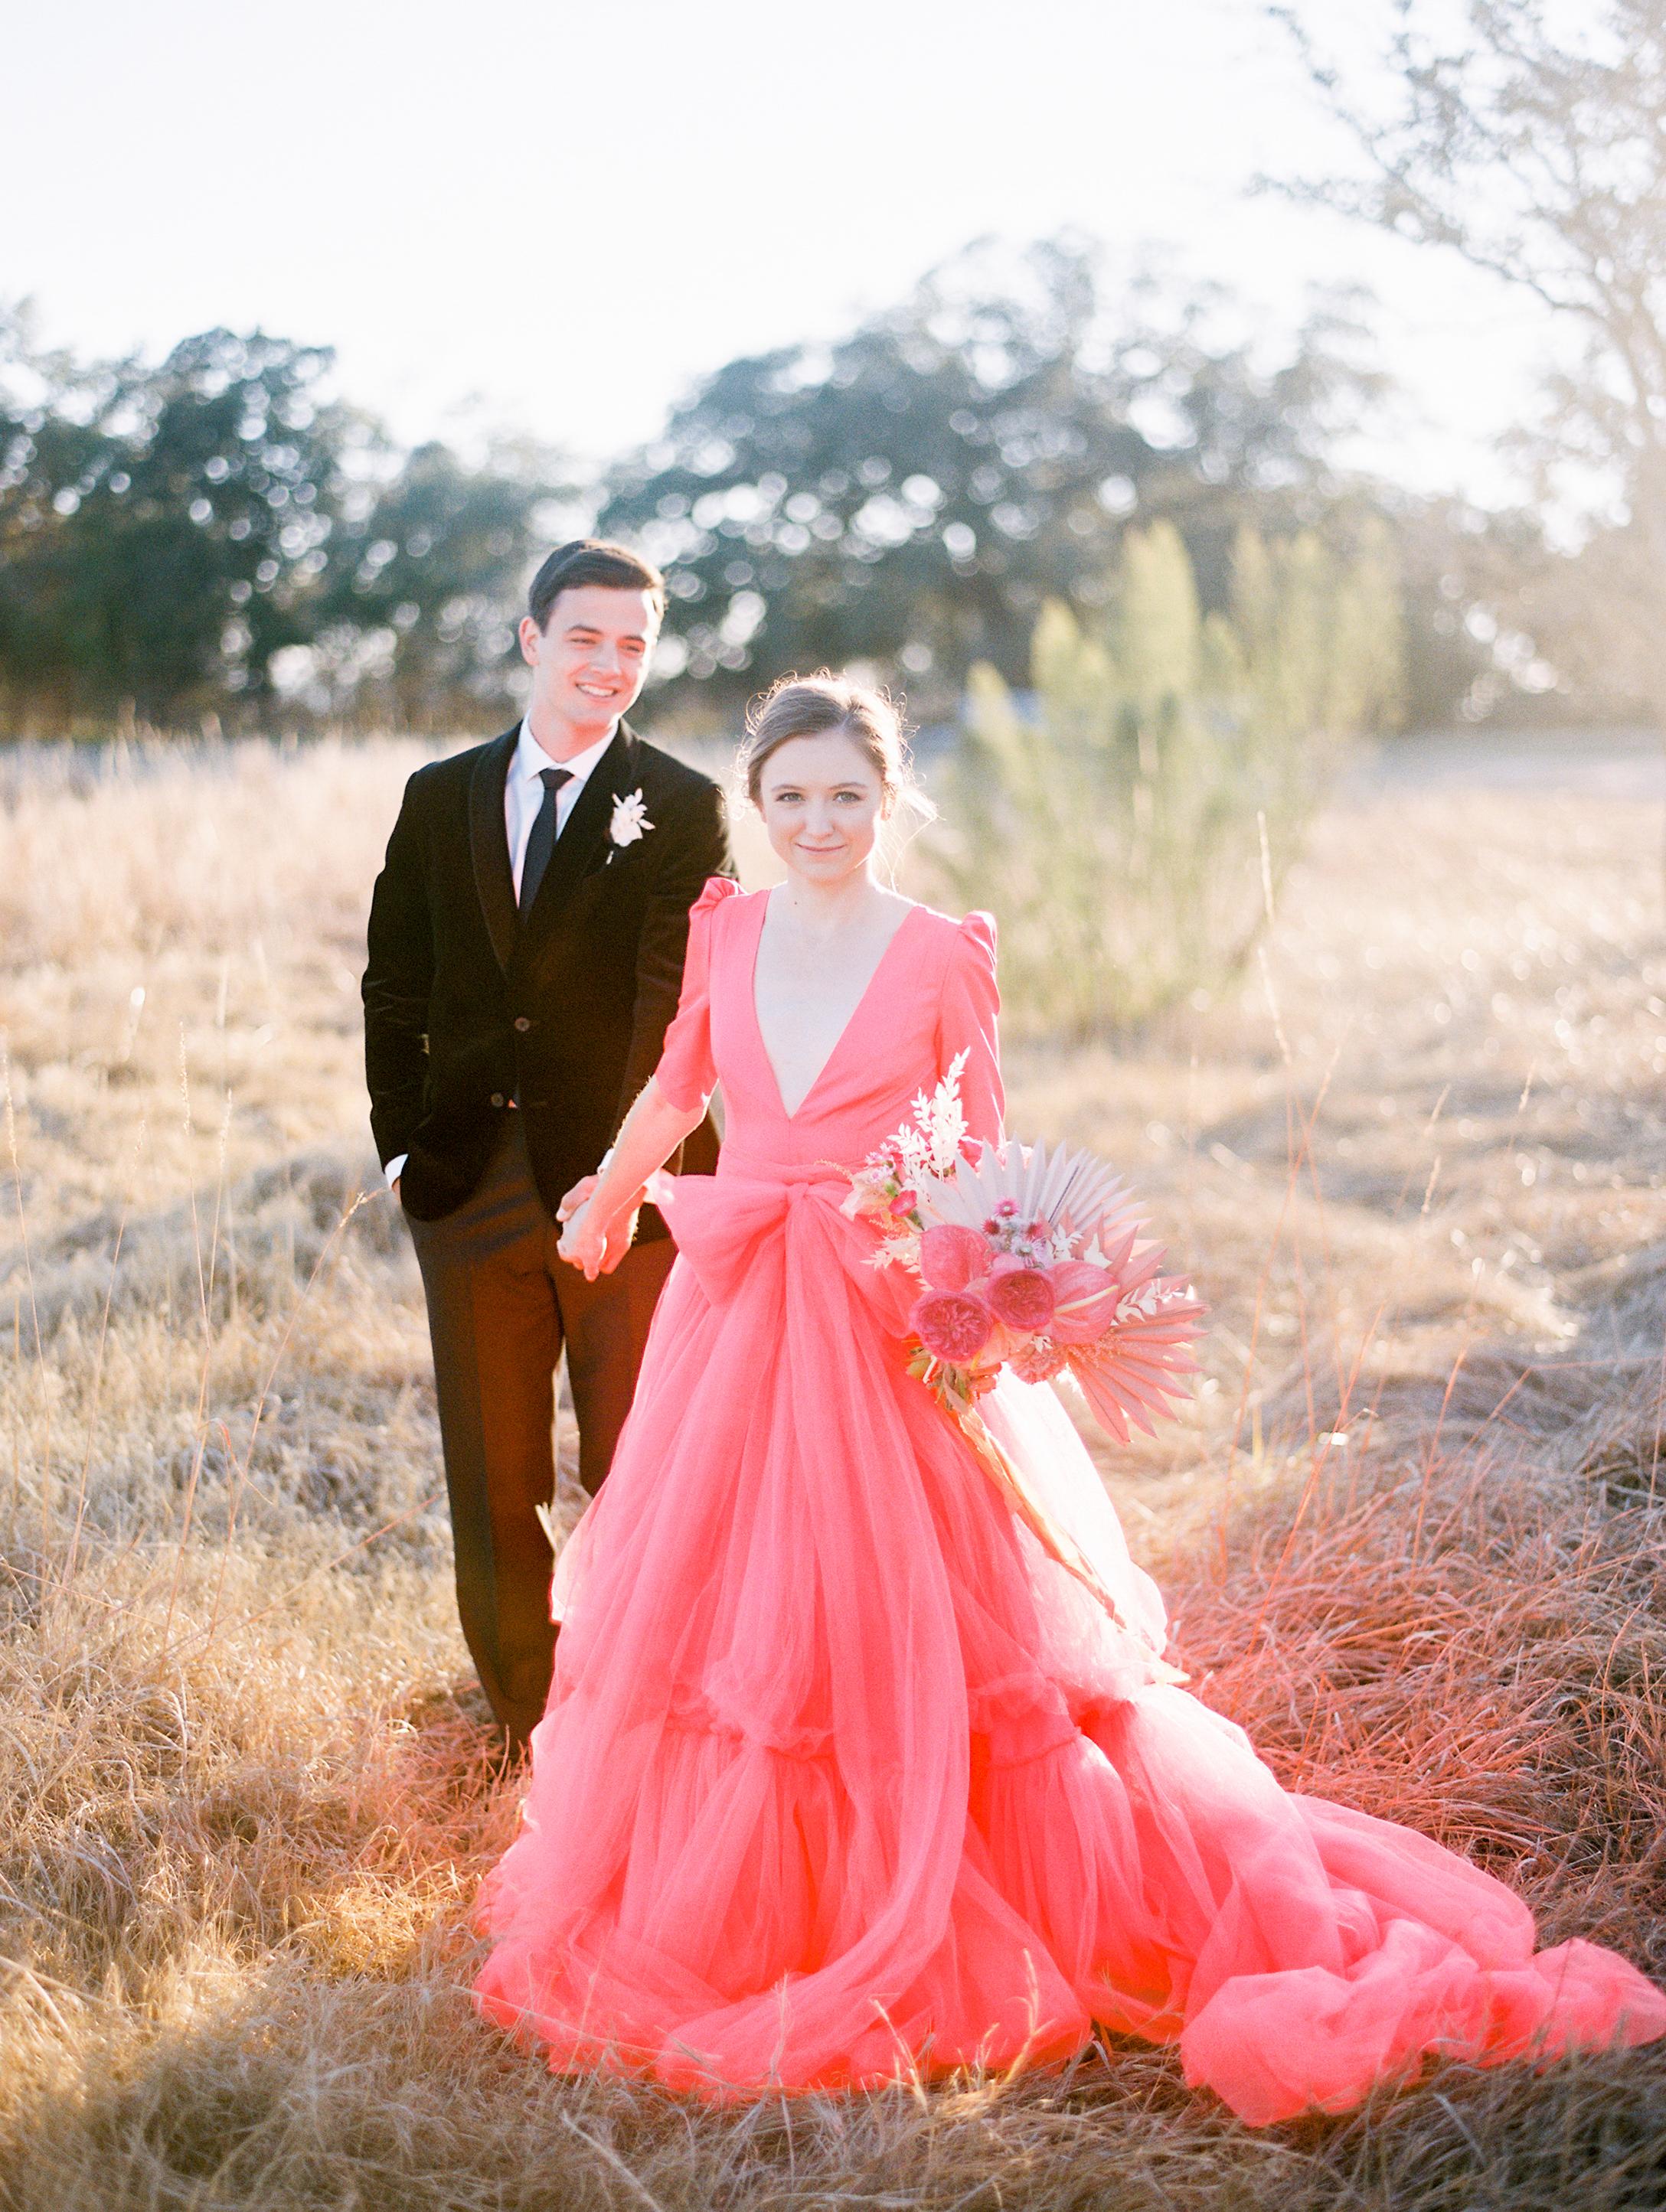 Kristin-La-Voie-Photography-Austin-Wedding-Photographer-Prospect-House-81.jpg